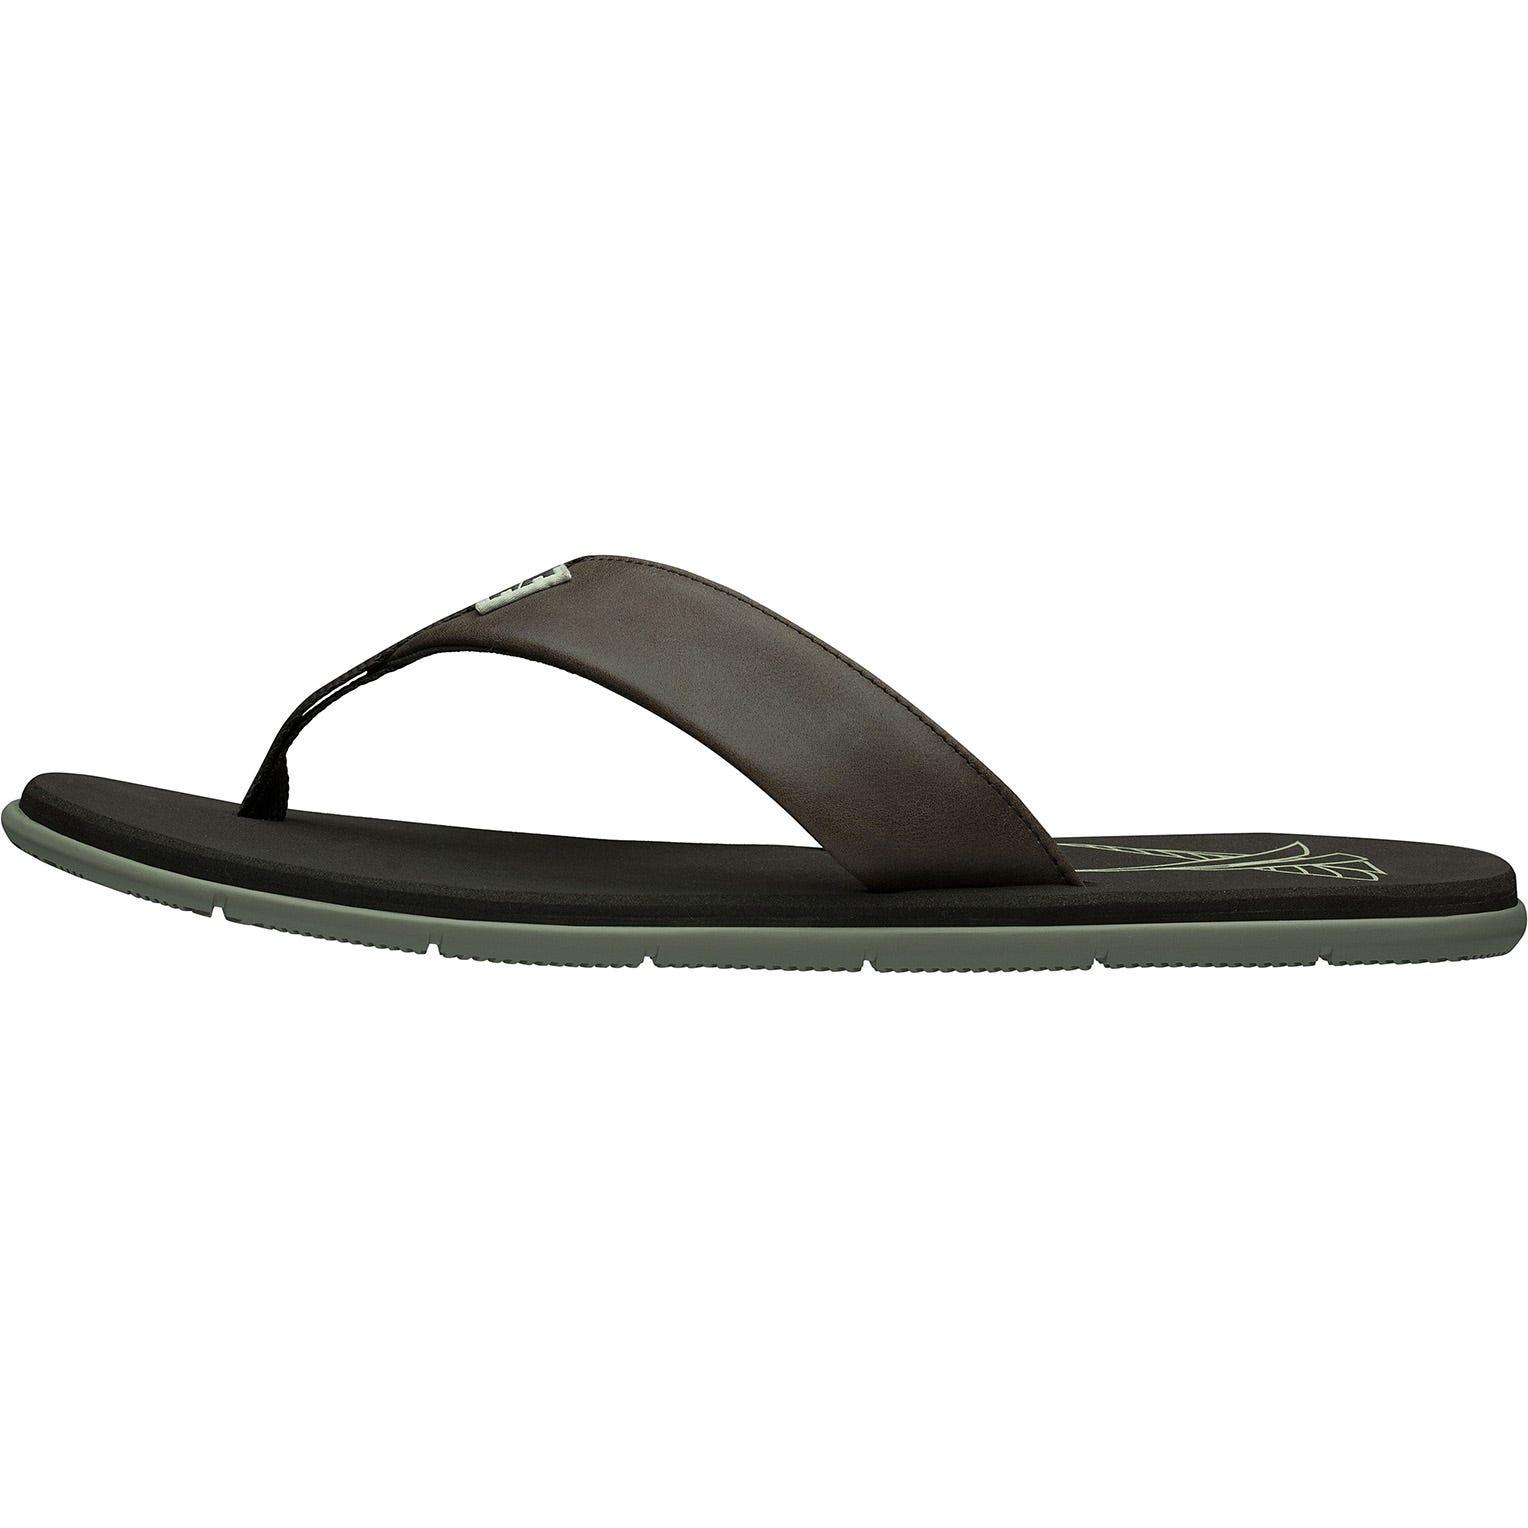 Helly Hansen Seasand Leather Sandal Mens Brown 48/13